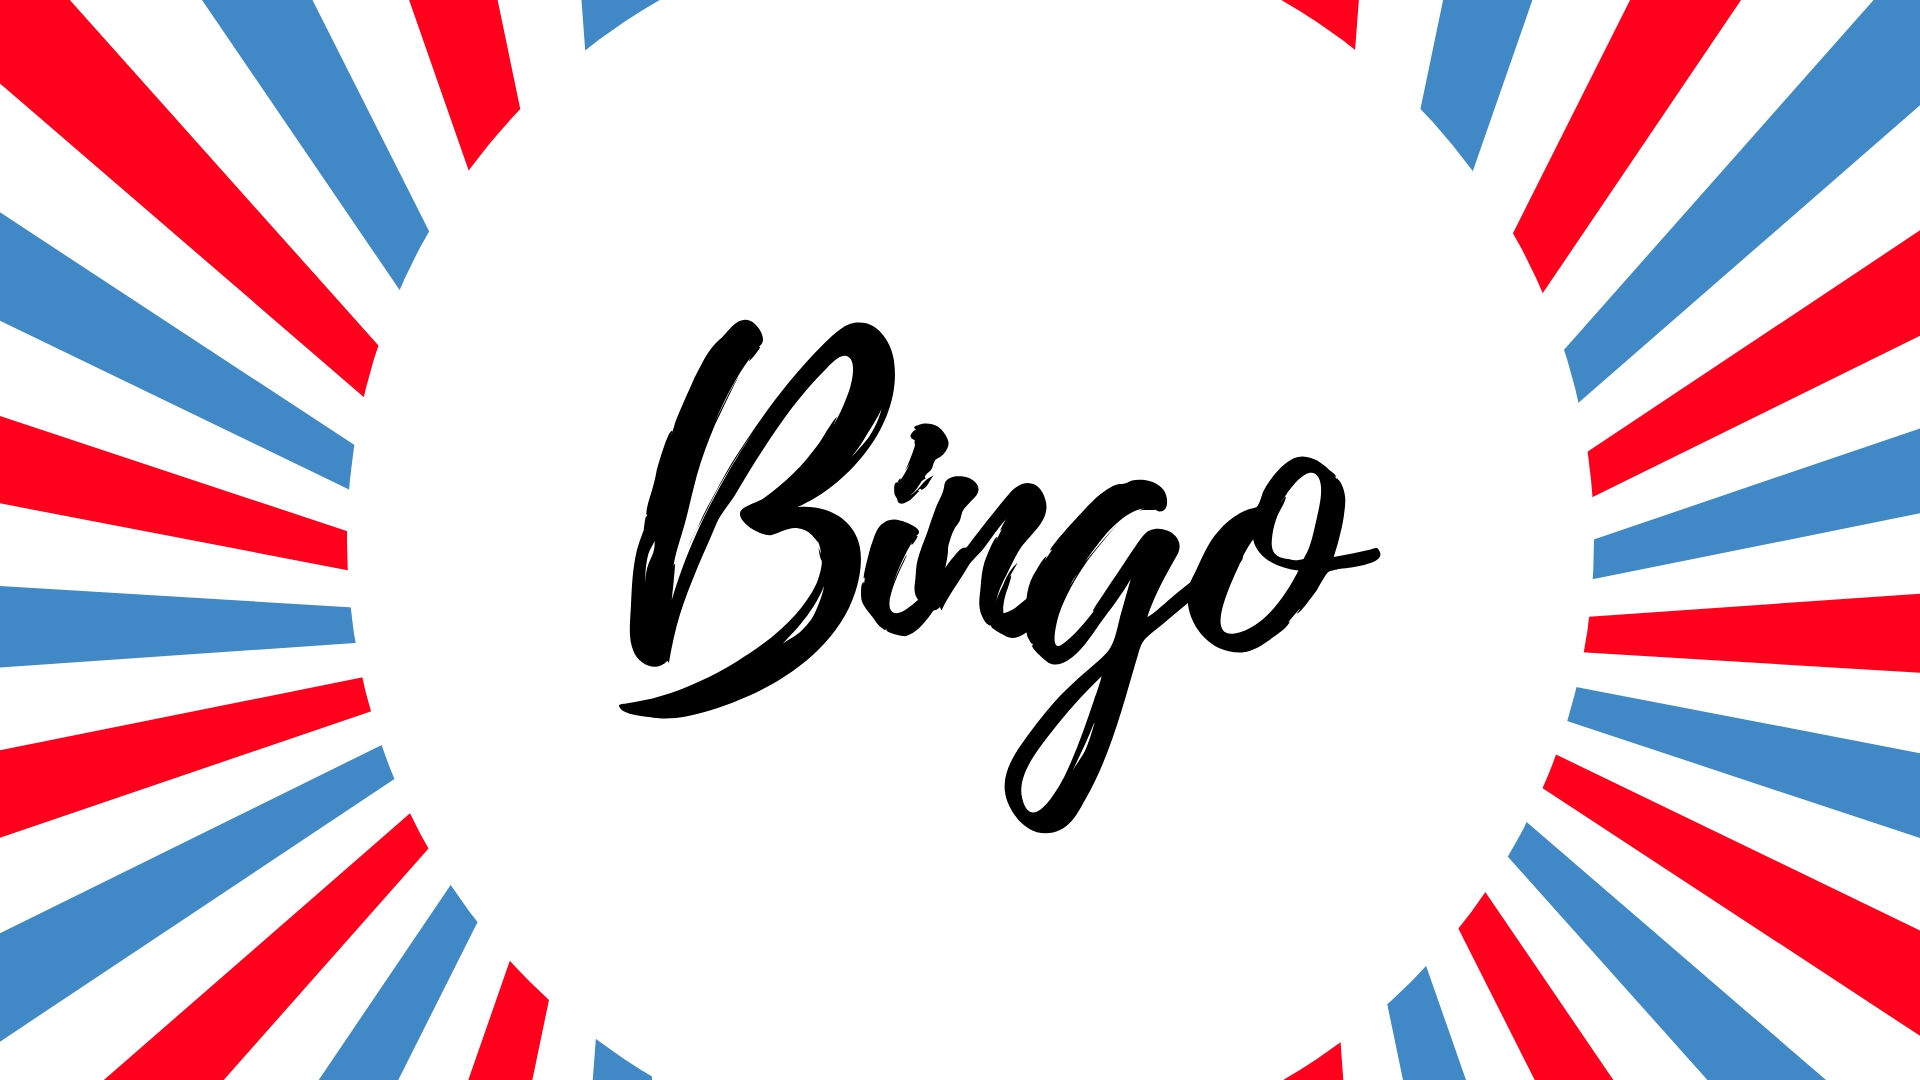 Bingo clipart tomorrow. Us army mwr fs